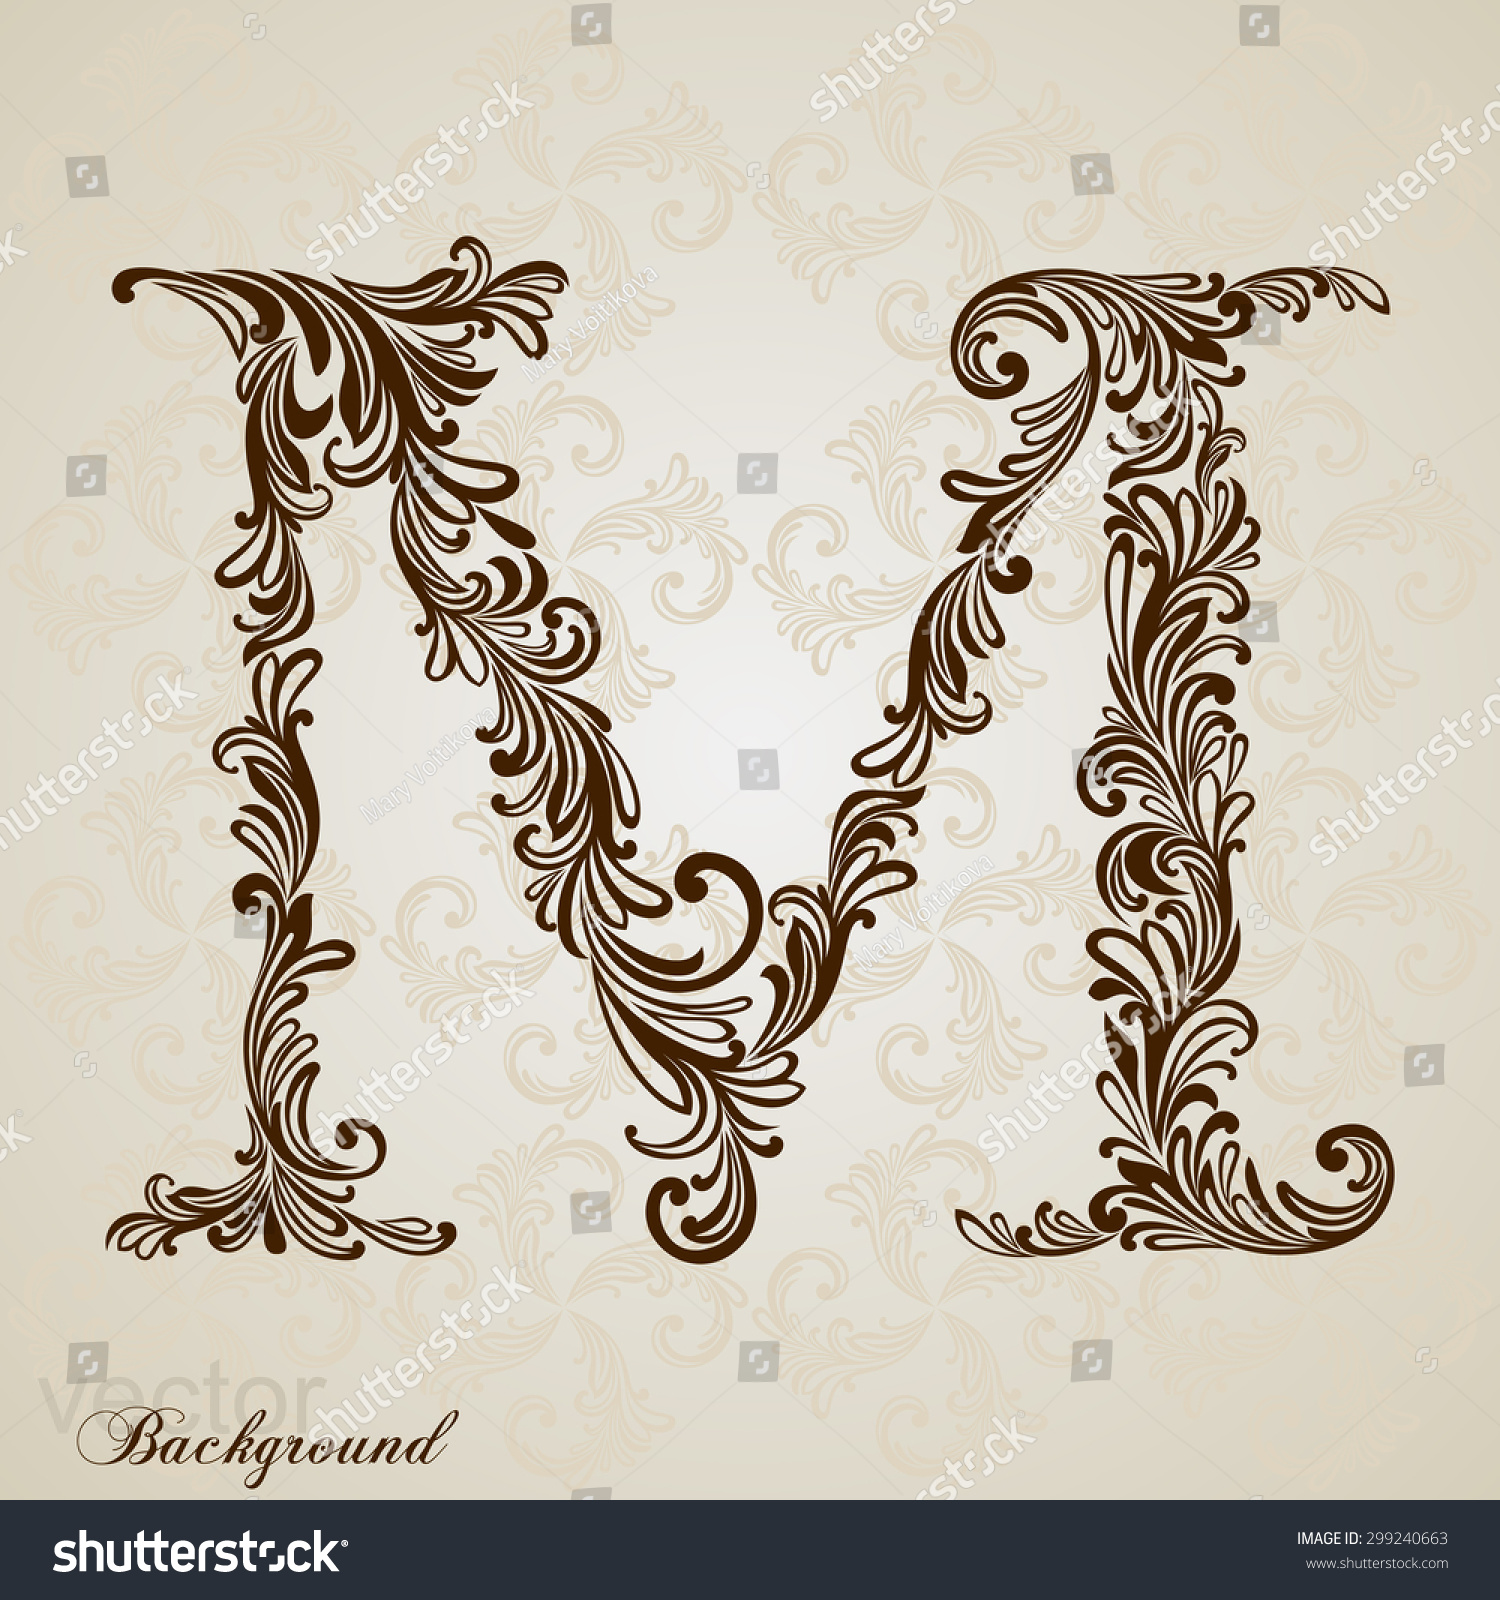 Poster design jobs online - Calligraphic Font Vintage Initials Letter M Vector Design M Letter